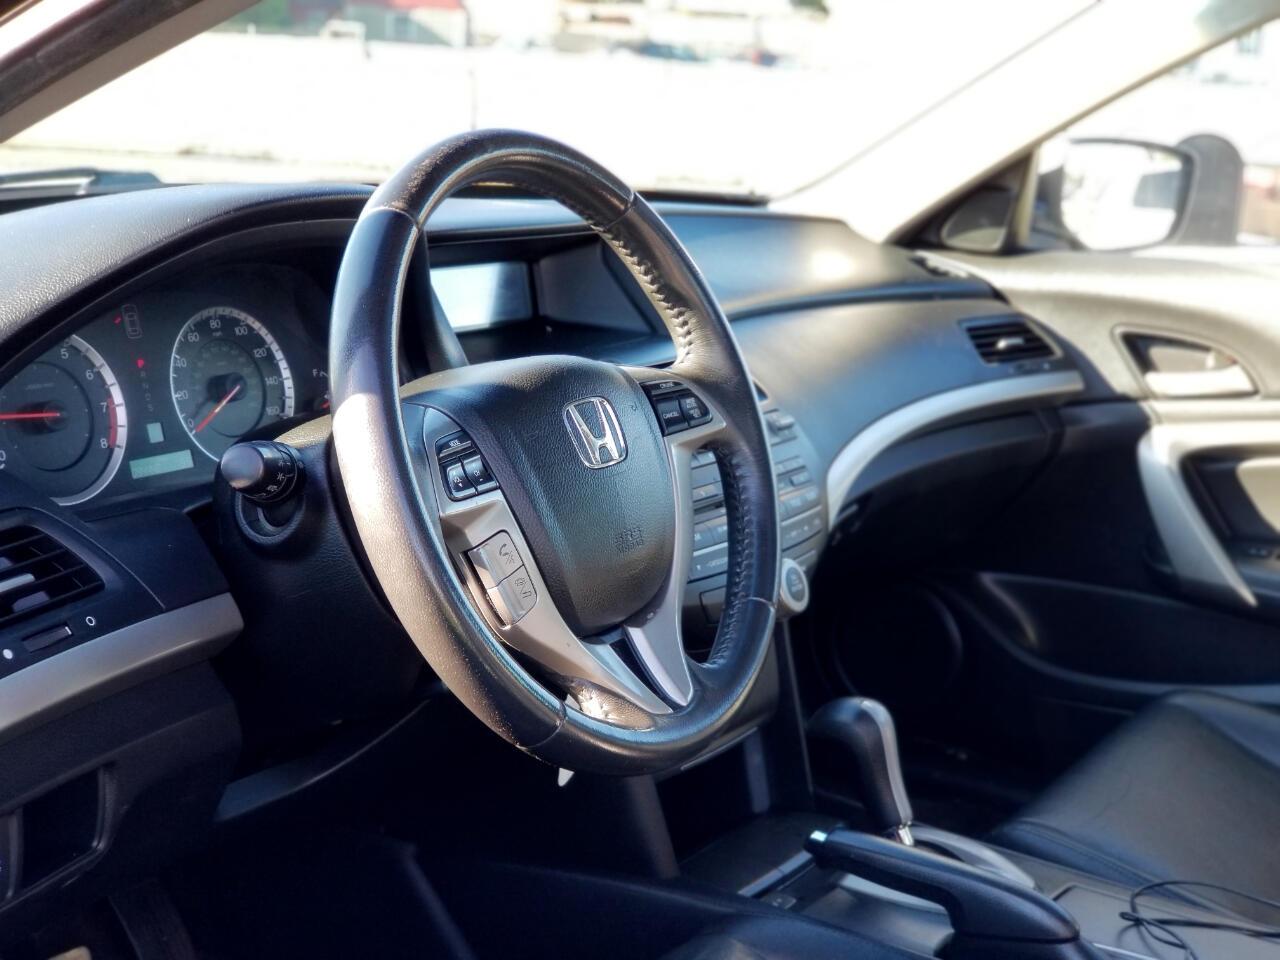 2013 Honda Accord Cpe 2dr I4 Auto EX-L